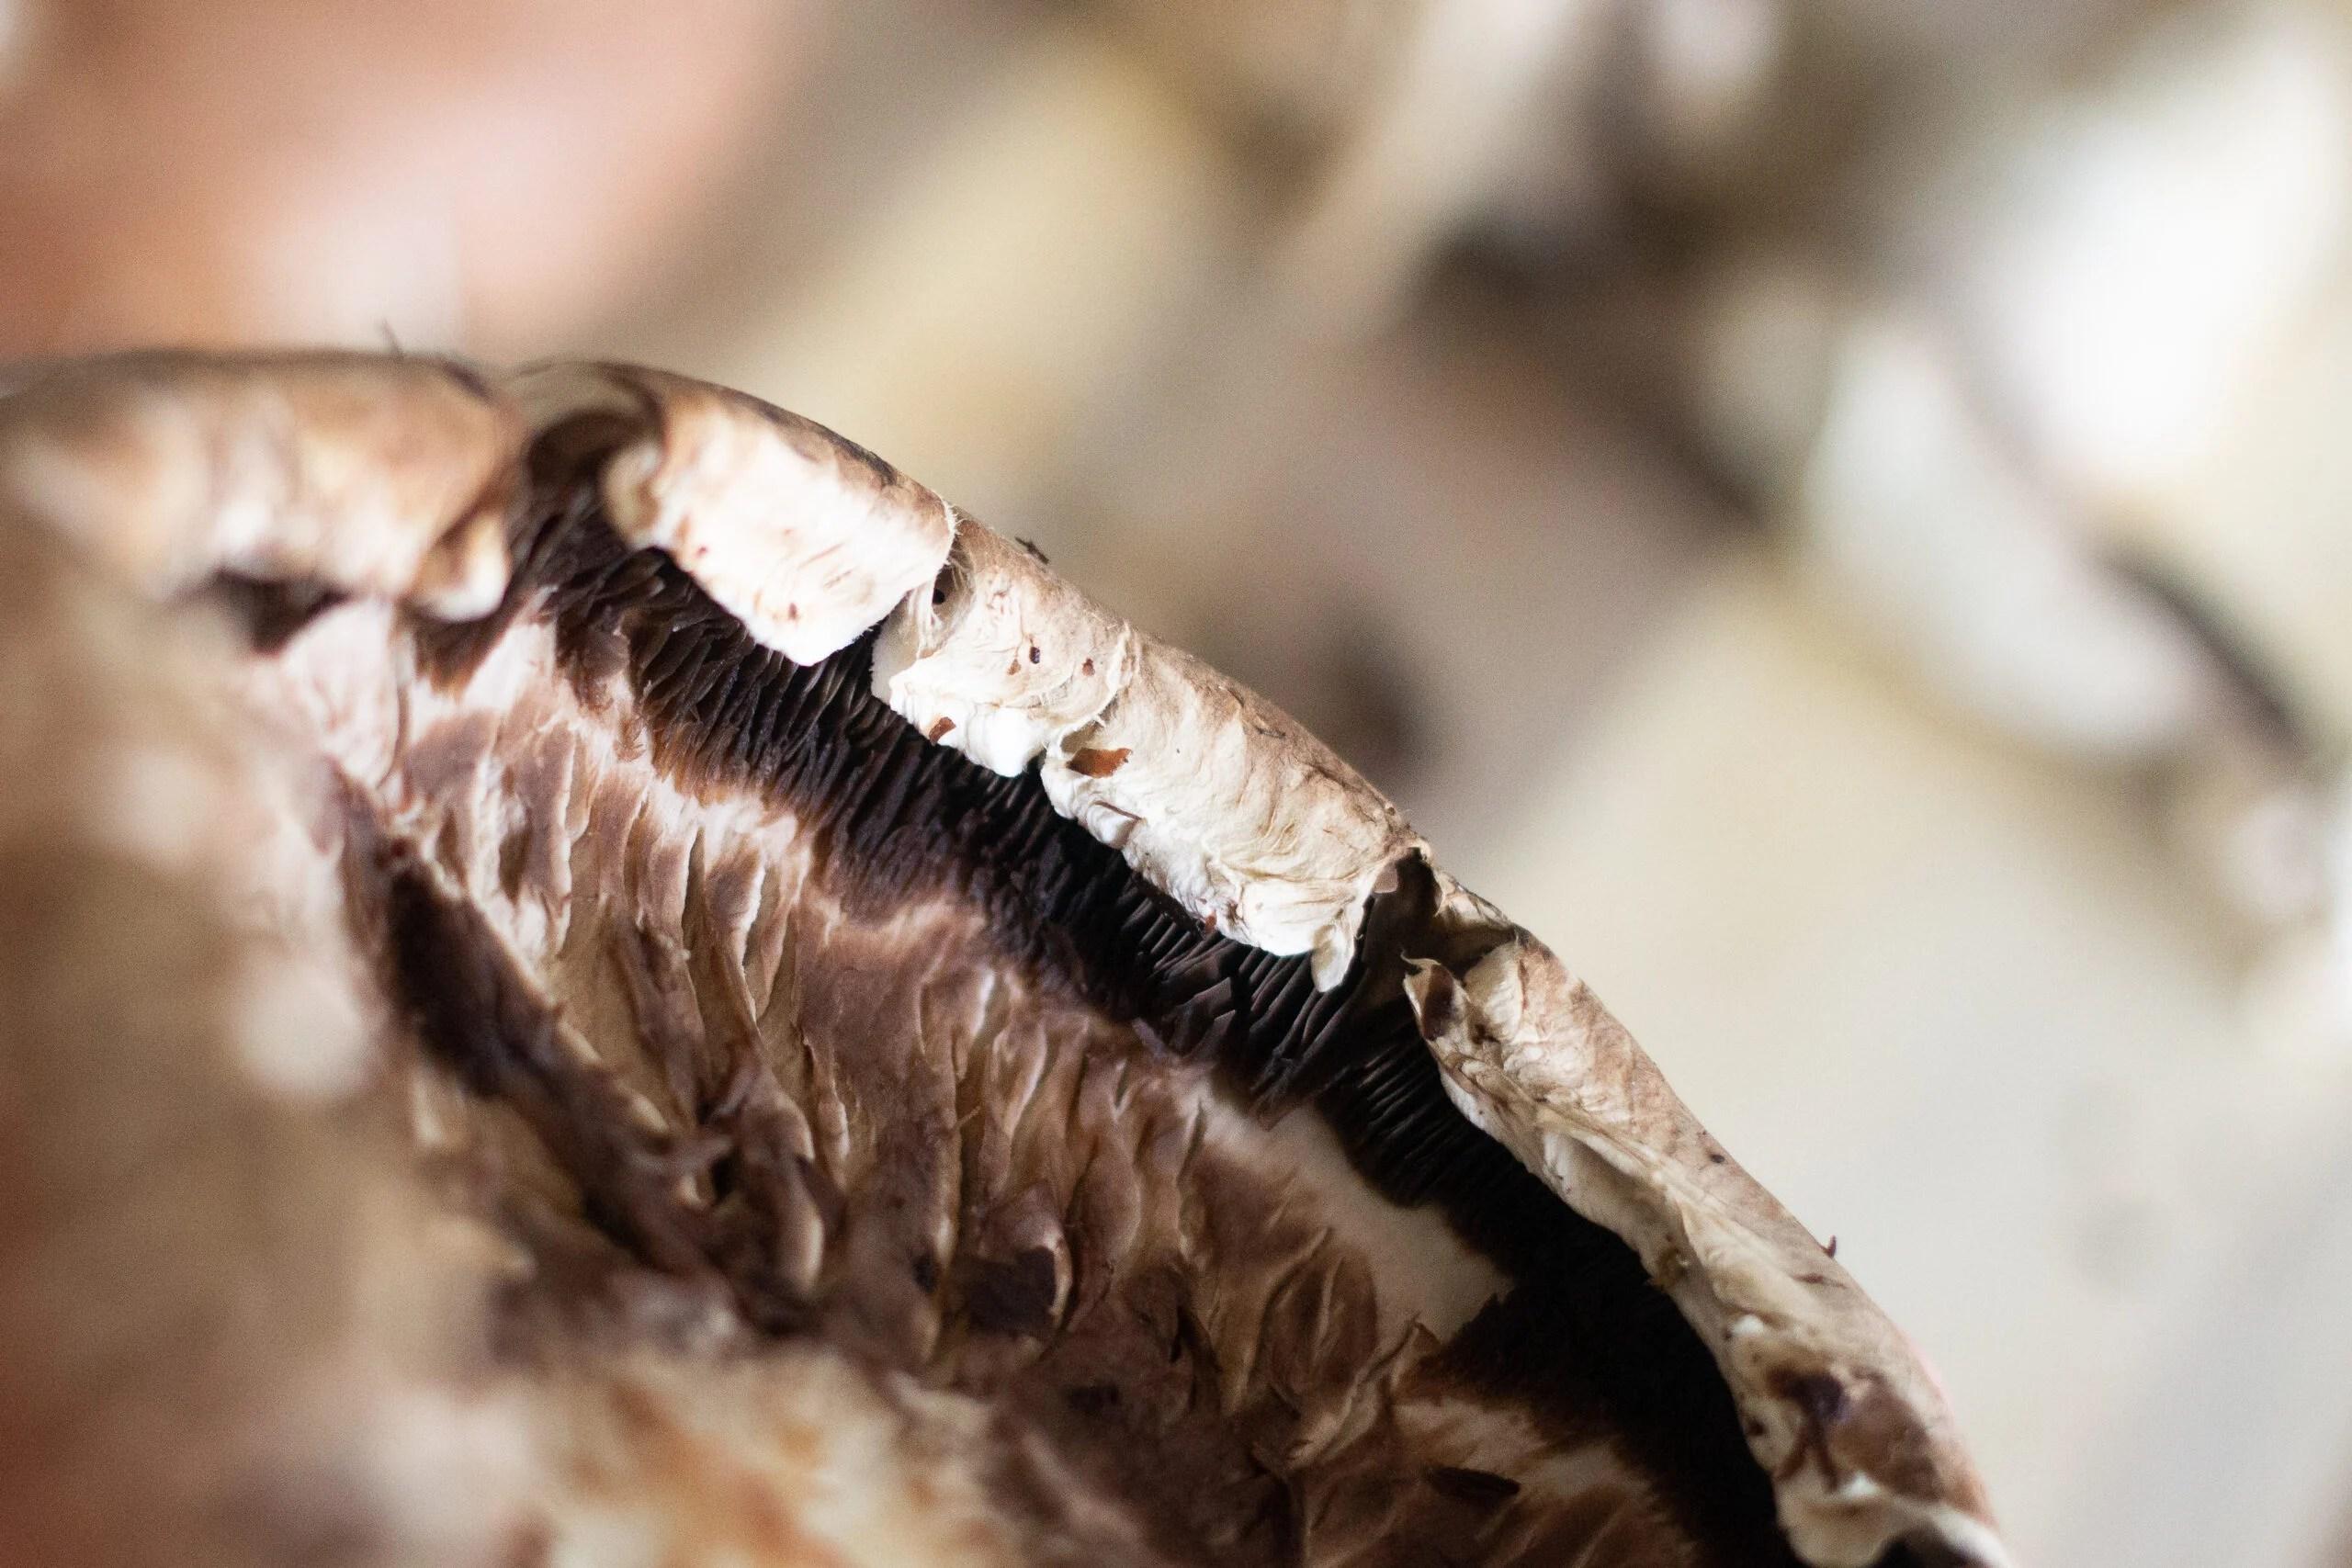 Close up of gills on portobello mushroom.